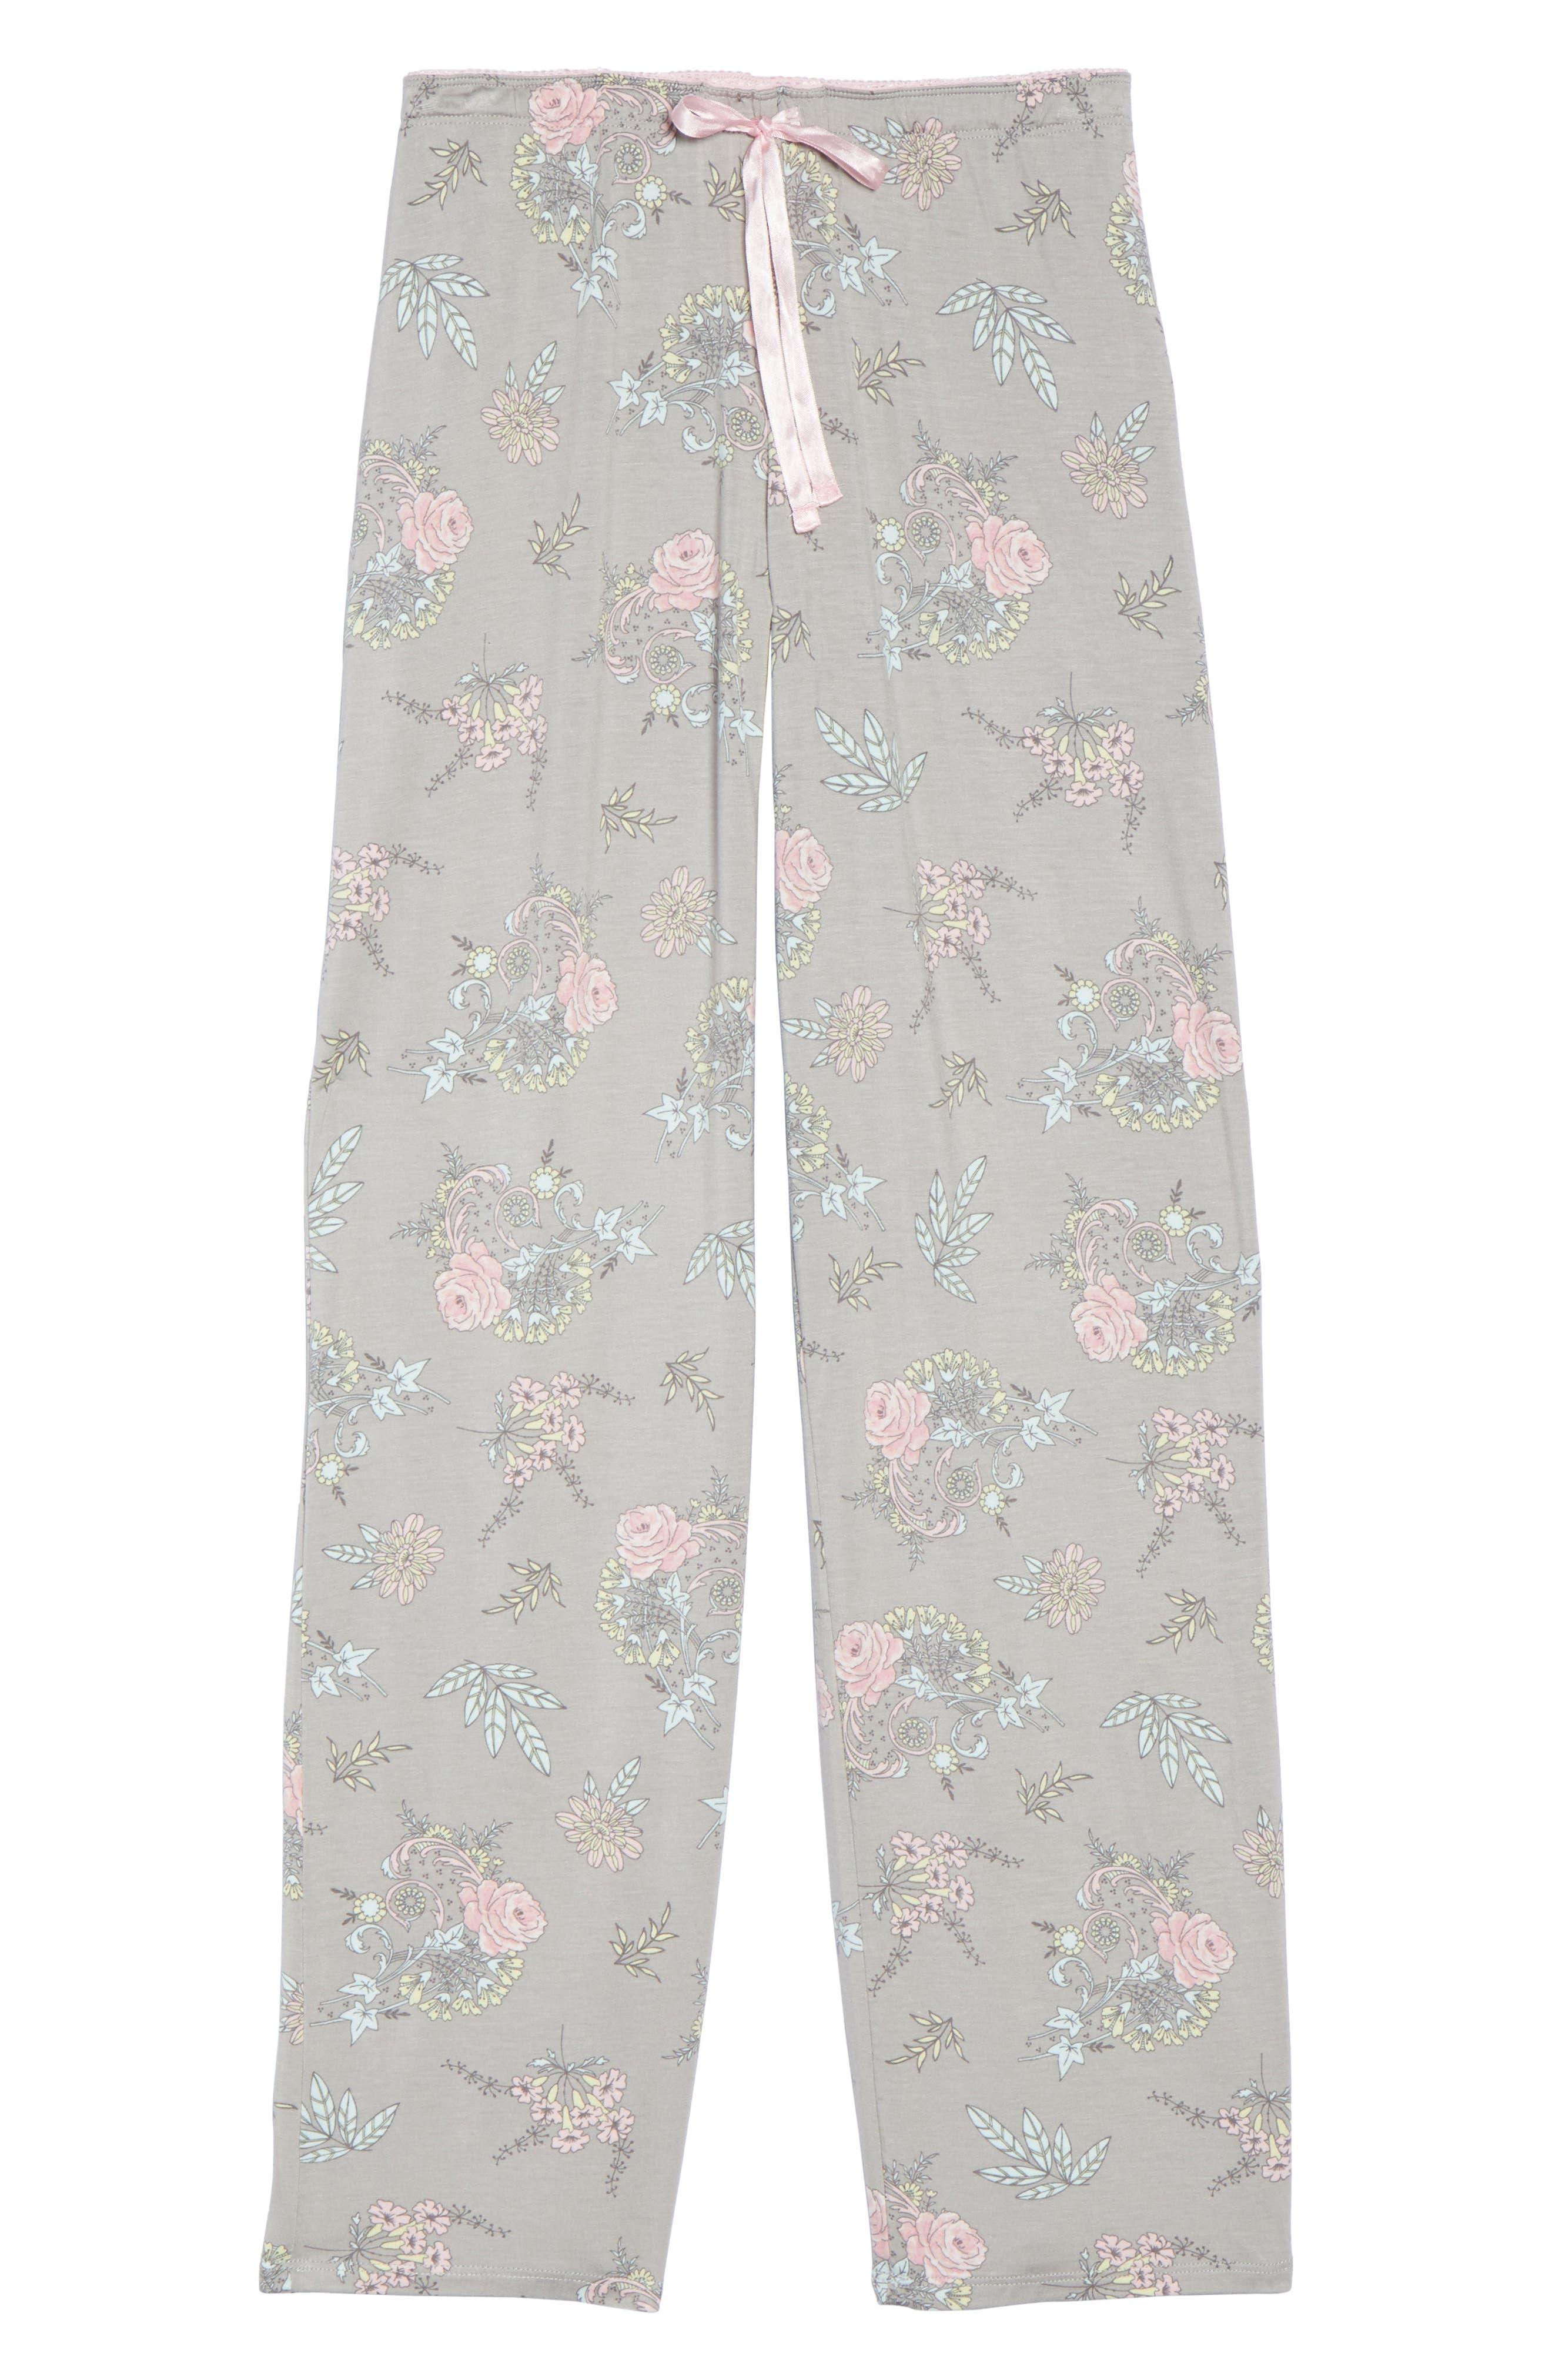 Drawstring Pajama Pants,                             Alternate thumbnail 6, color,                             020